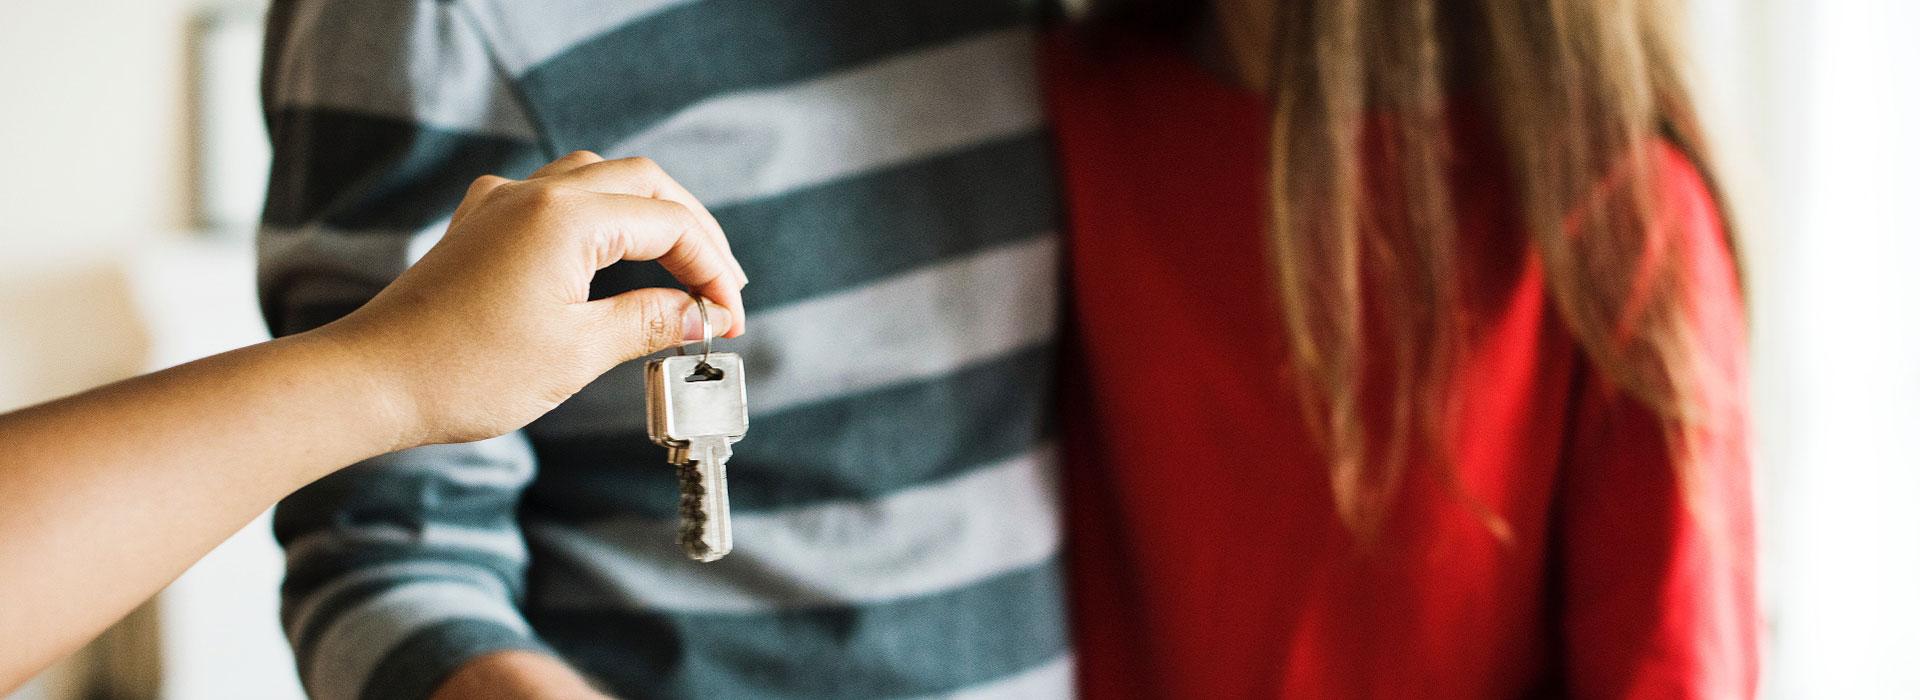 ROCHE Hypotheken